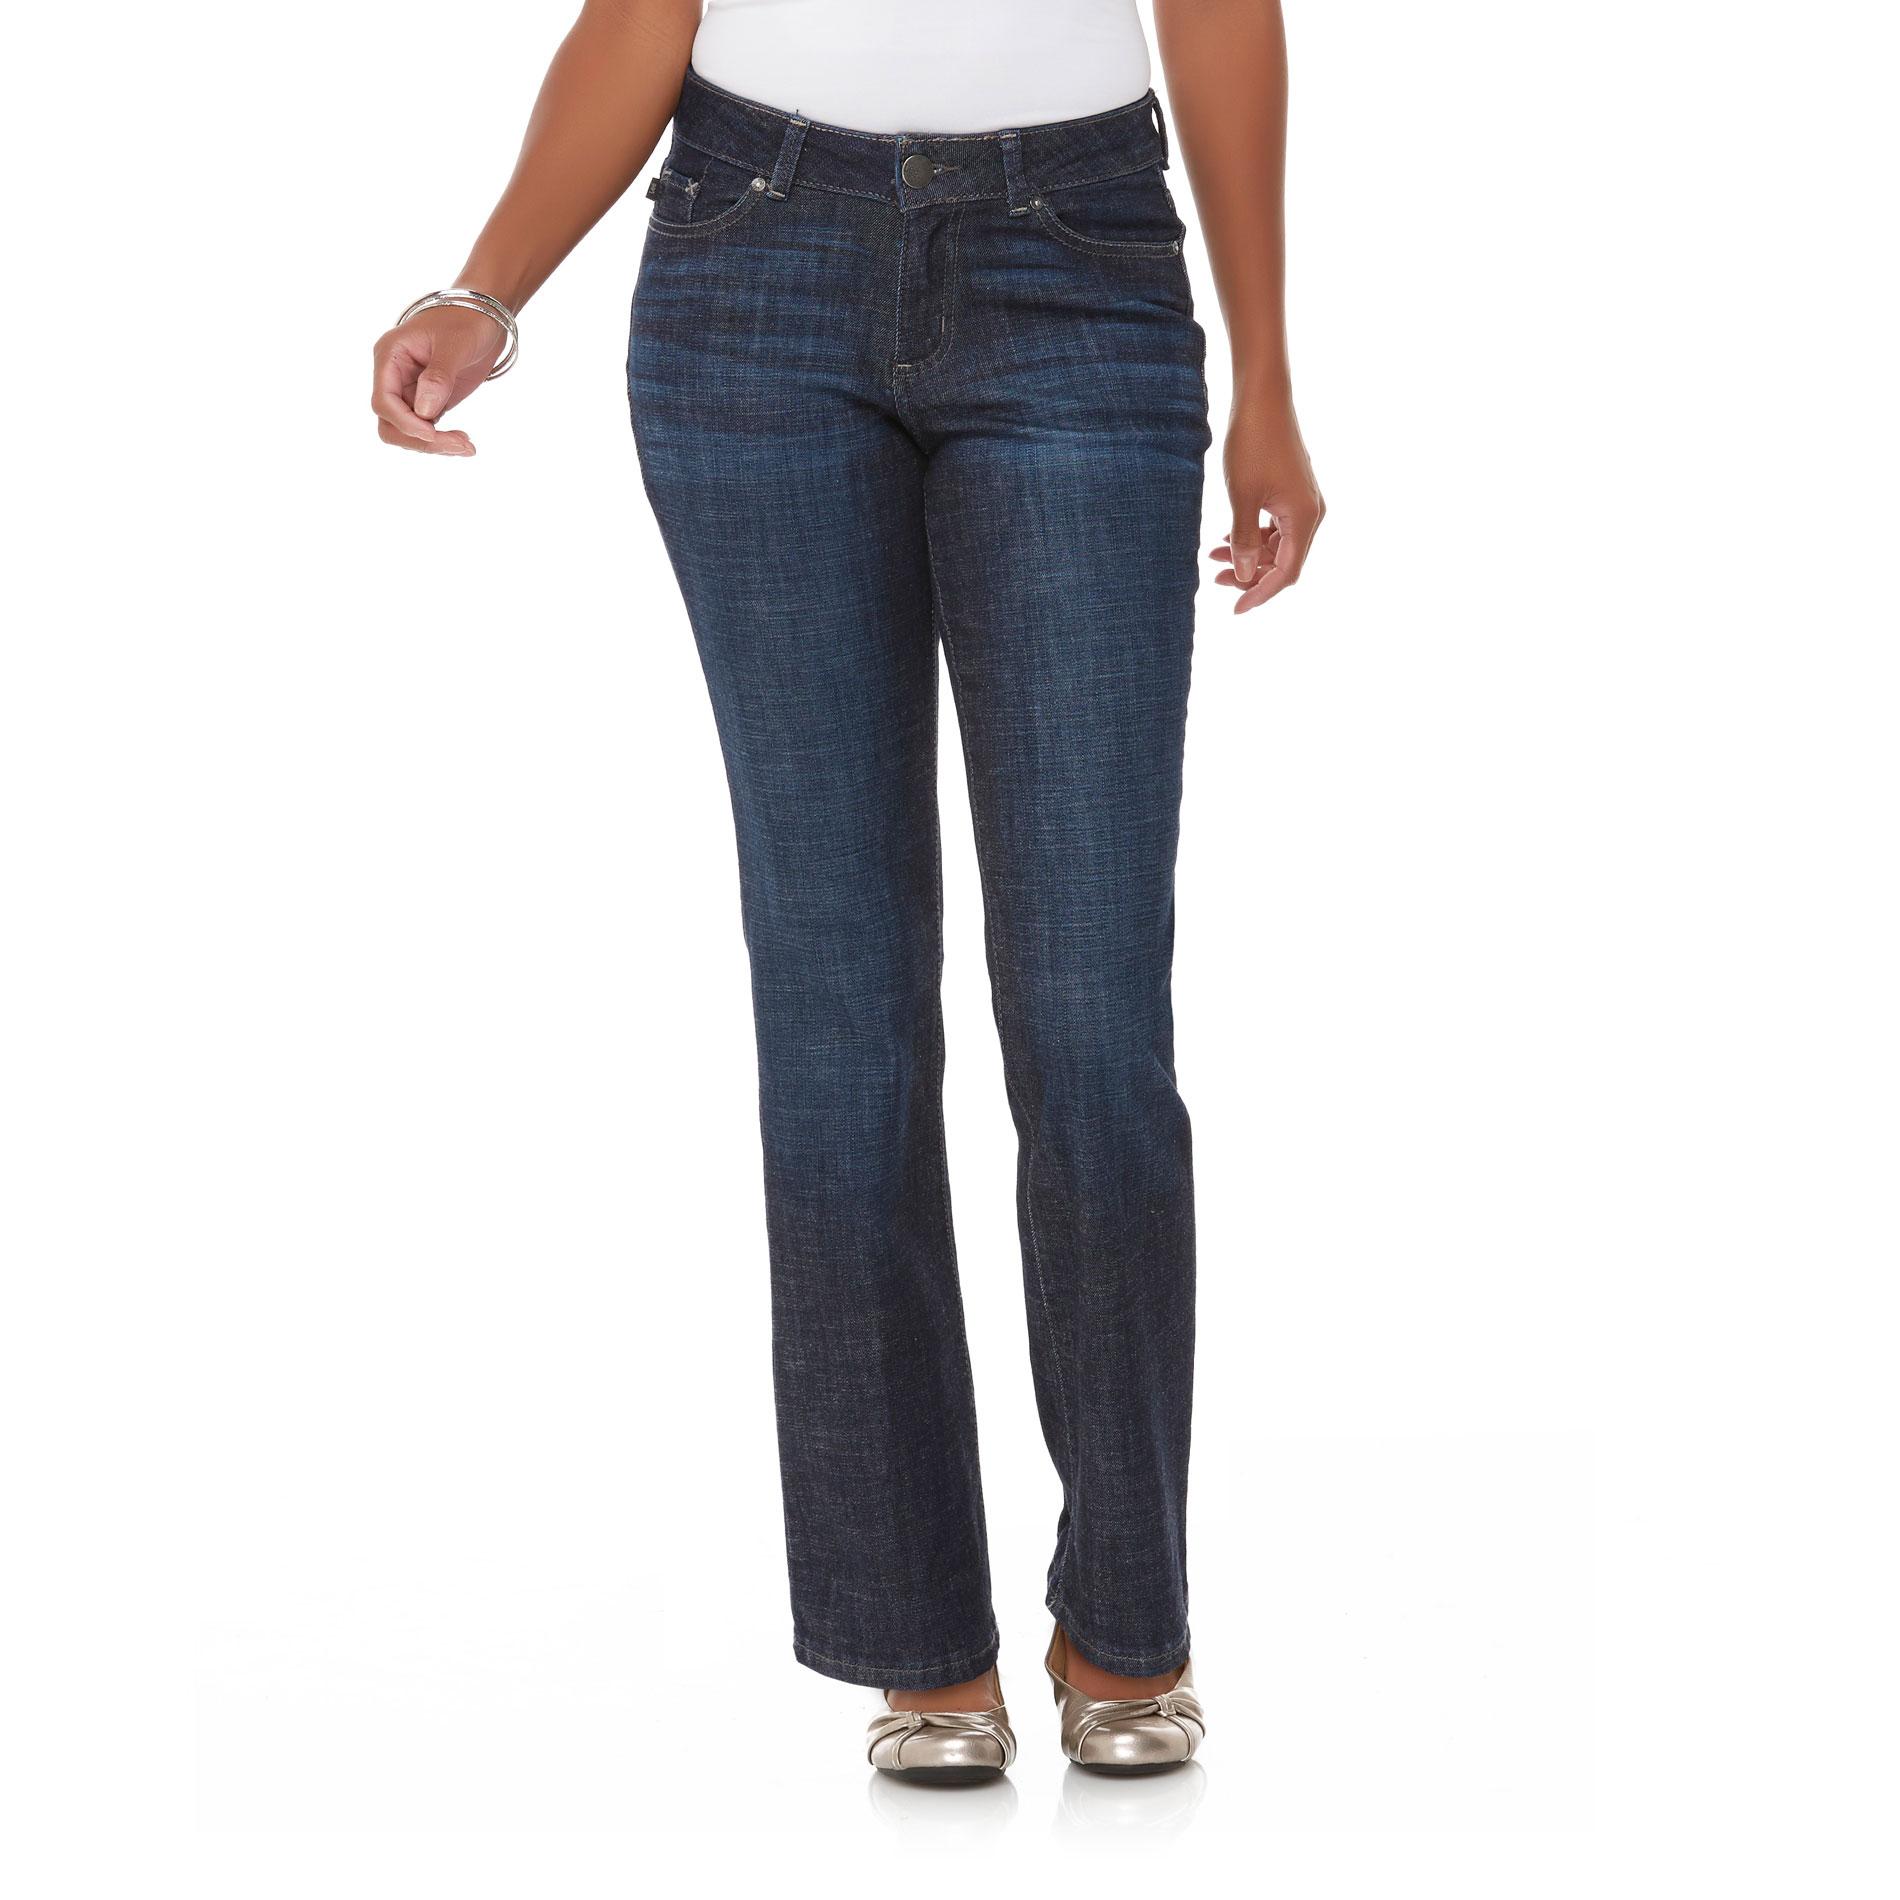 Lee Petite' Curvy Fit Bootcut Jeans